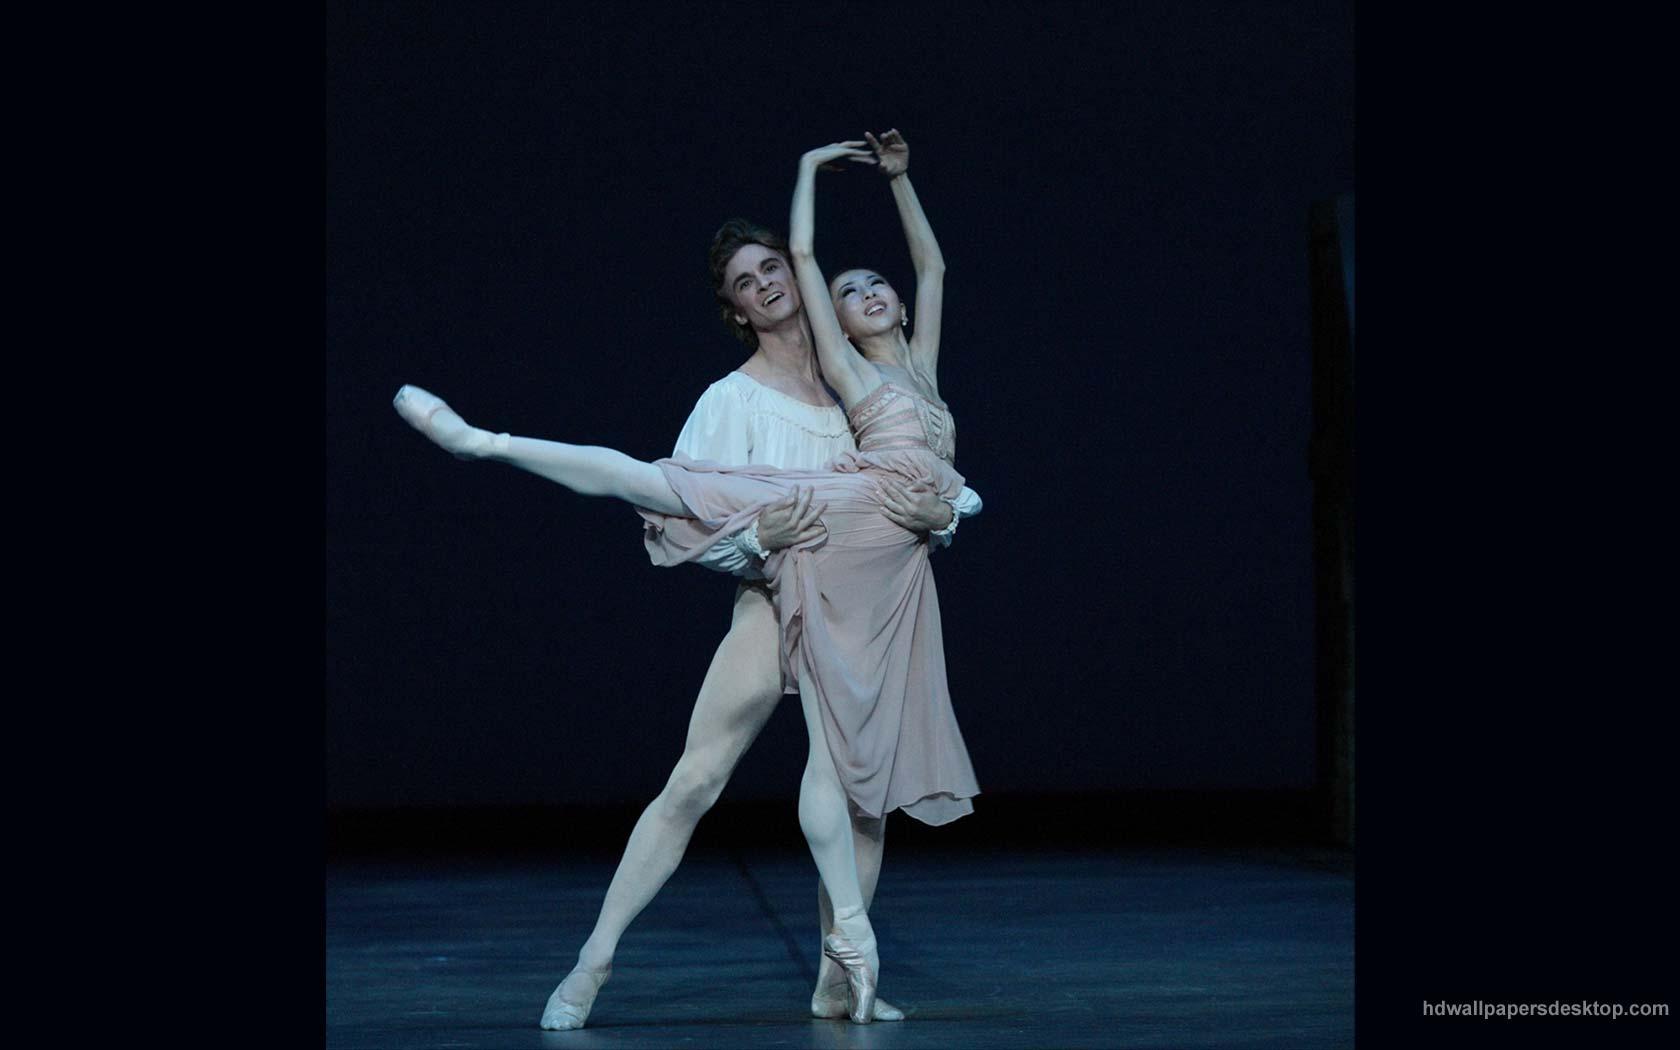 Pin Ballet Dance Wallpapers 1680x1050